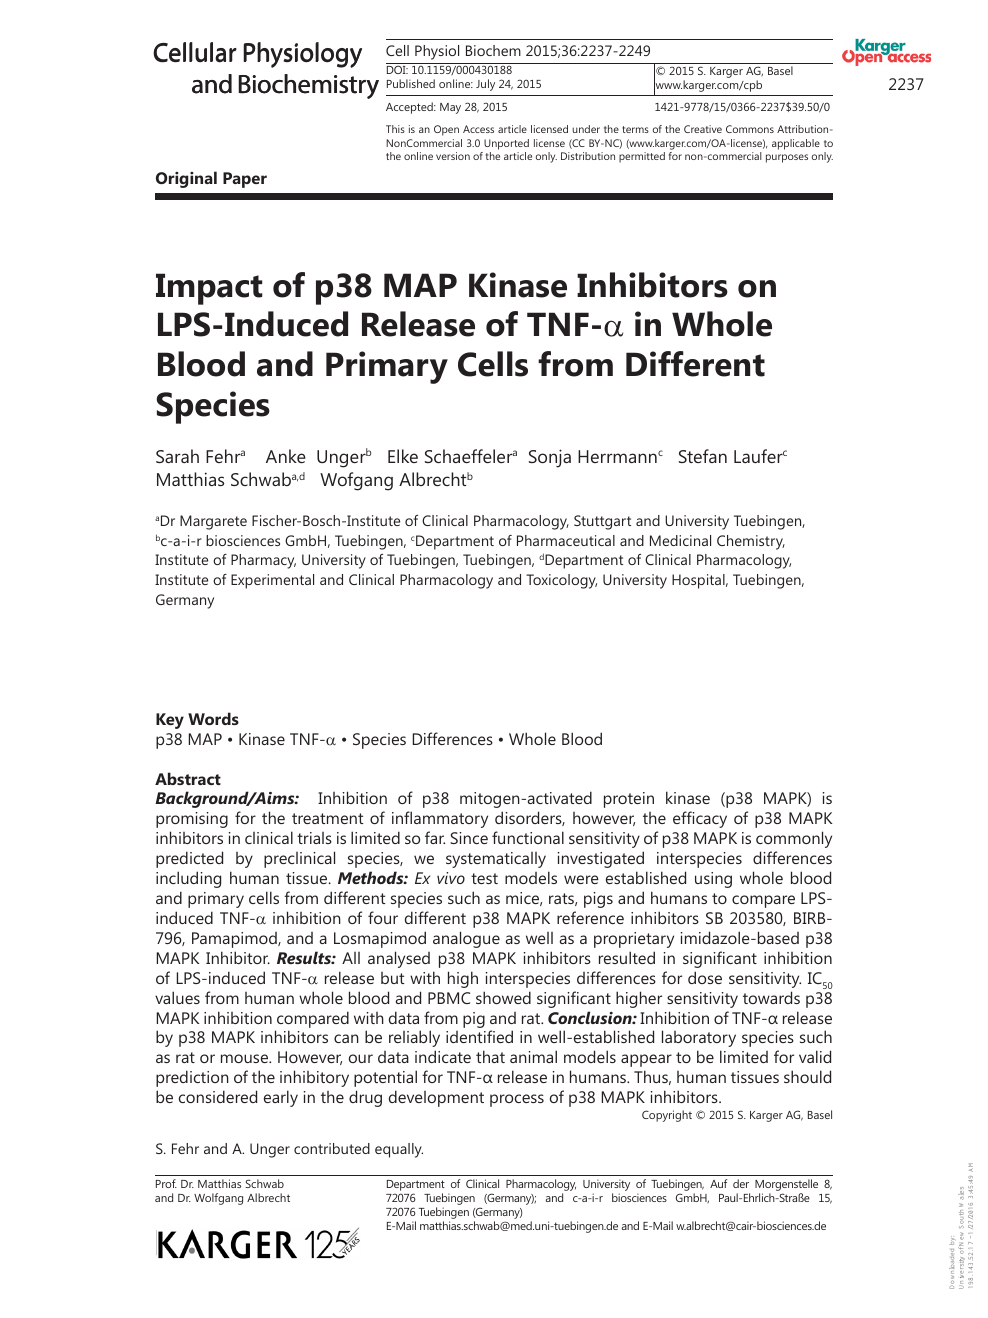 Impact of p38 MAP Kinase Inhibitors on LPS-Induced Release ... on mtor inhibitor, protein kinase inhibitor, pi 3 kinase inhibitor, tyrosine kinase inhibitor, jak kinase inhibitor,